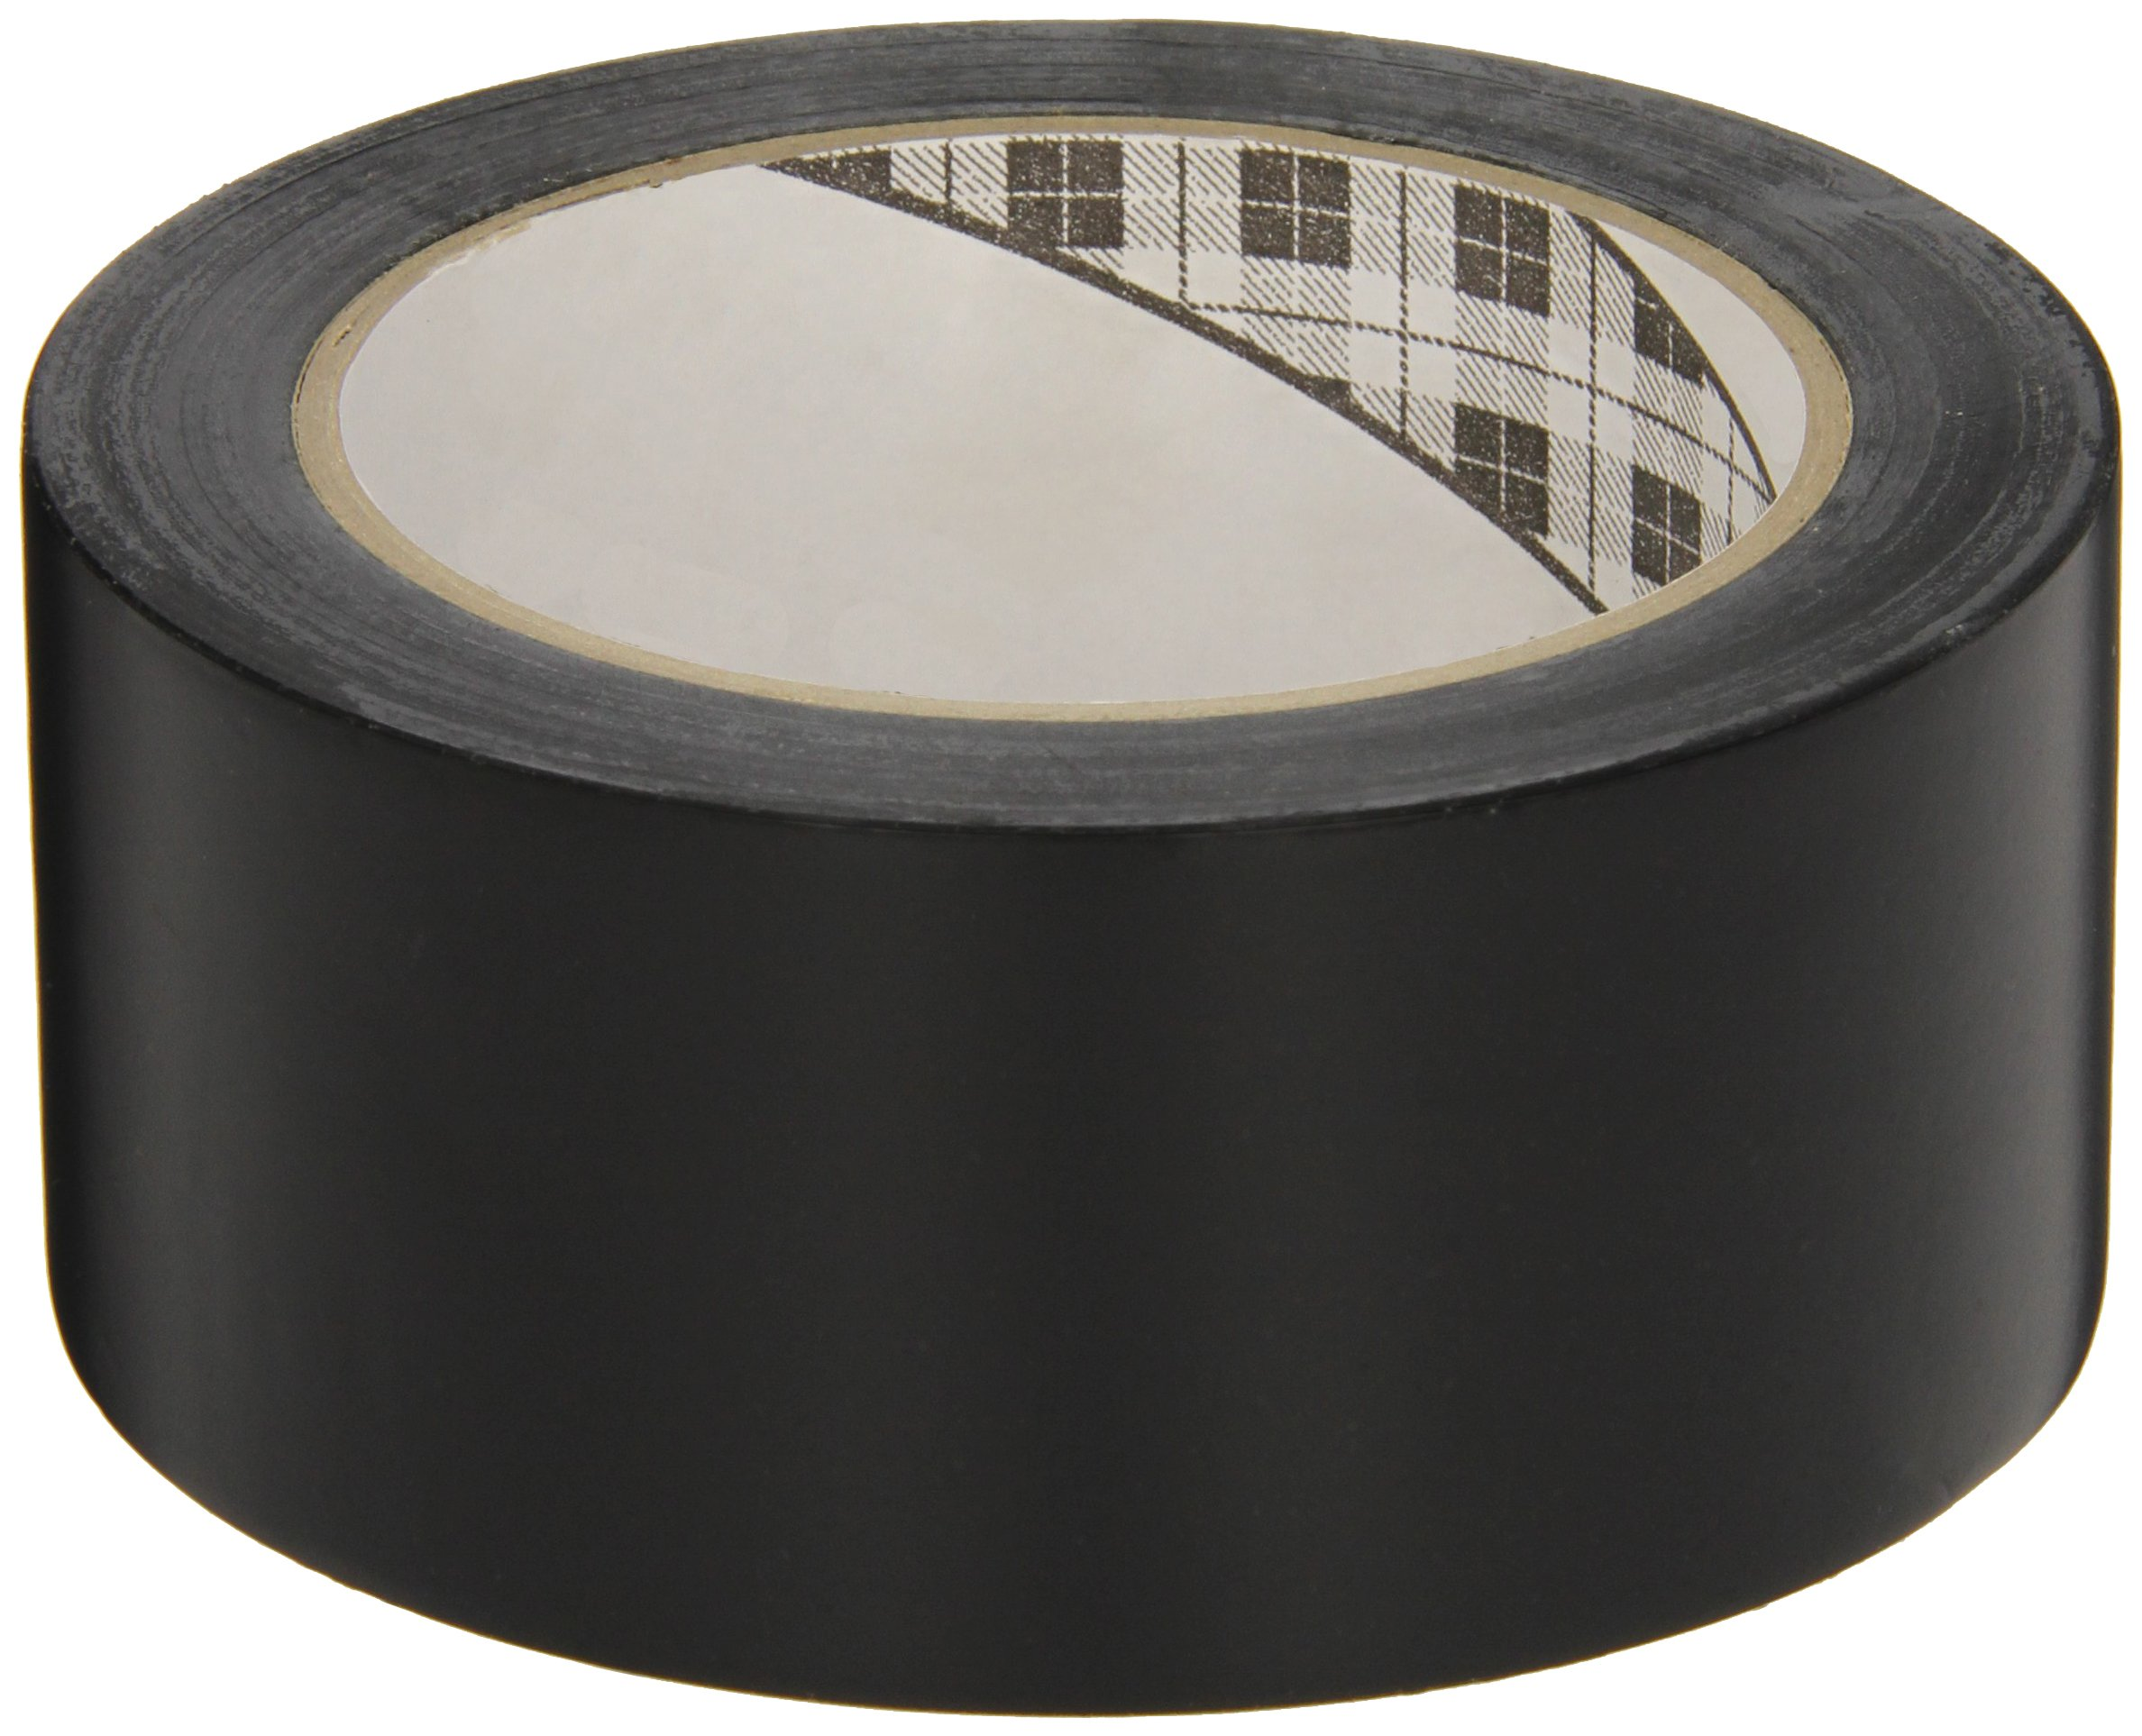 3M General Purpose Vinyl Tape 764 Black, 2 in x 36